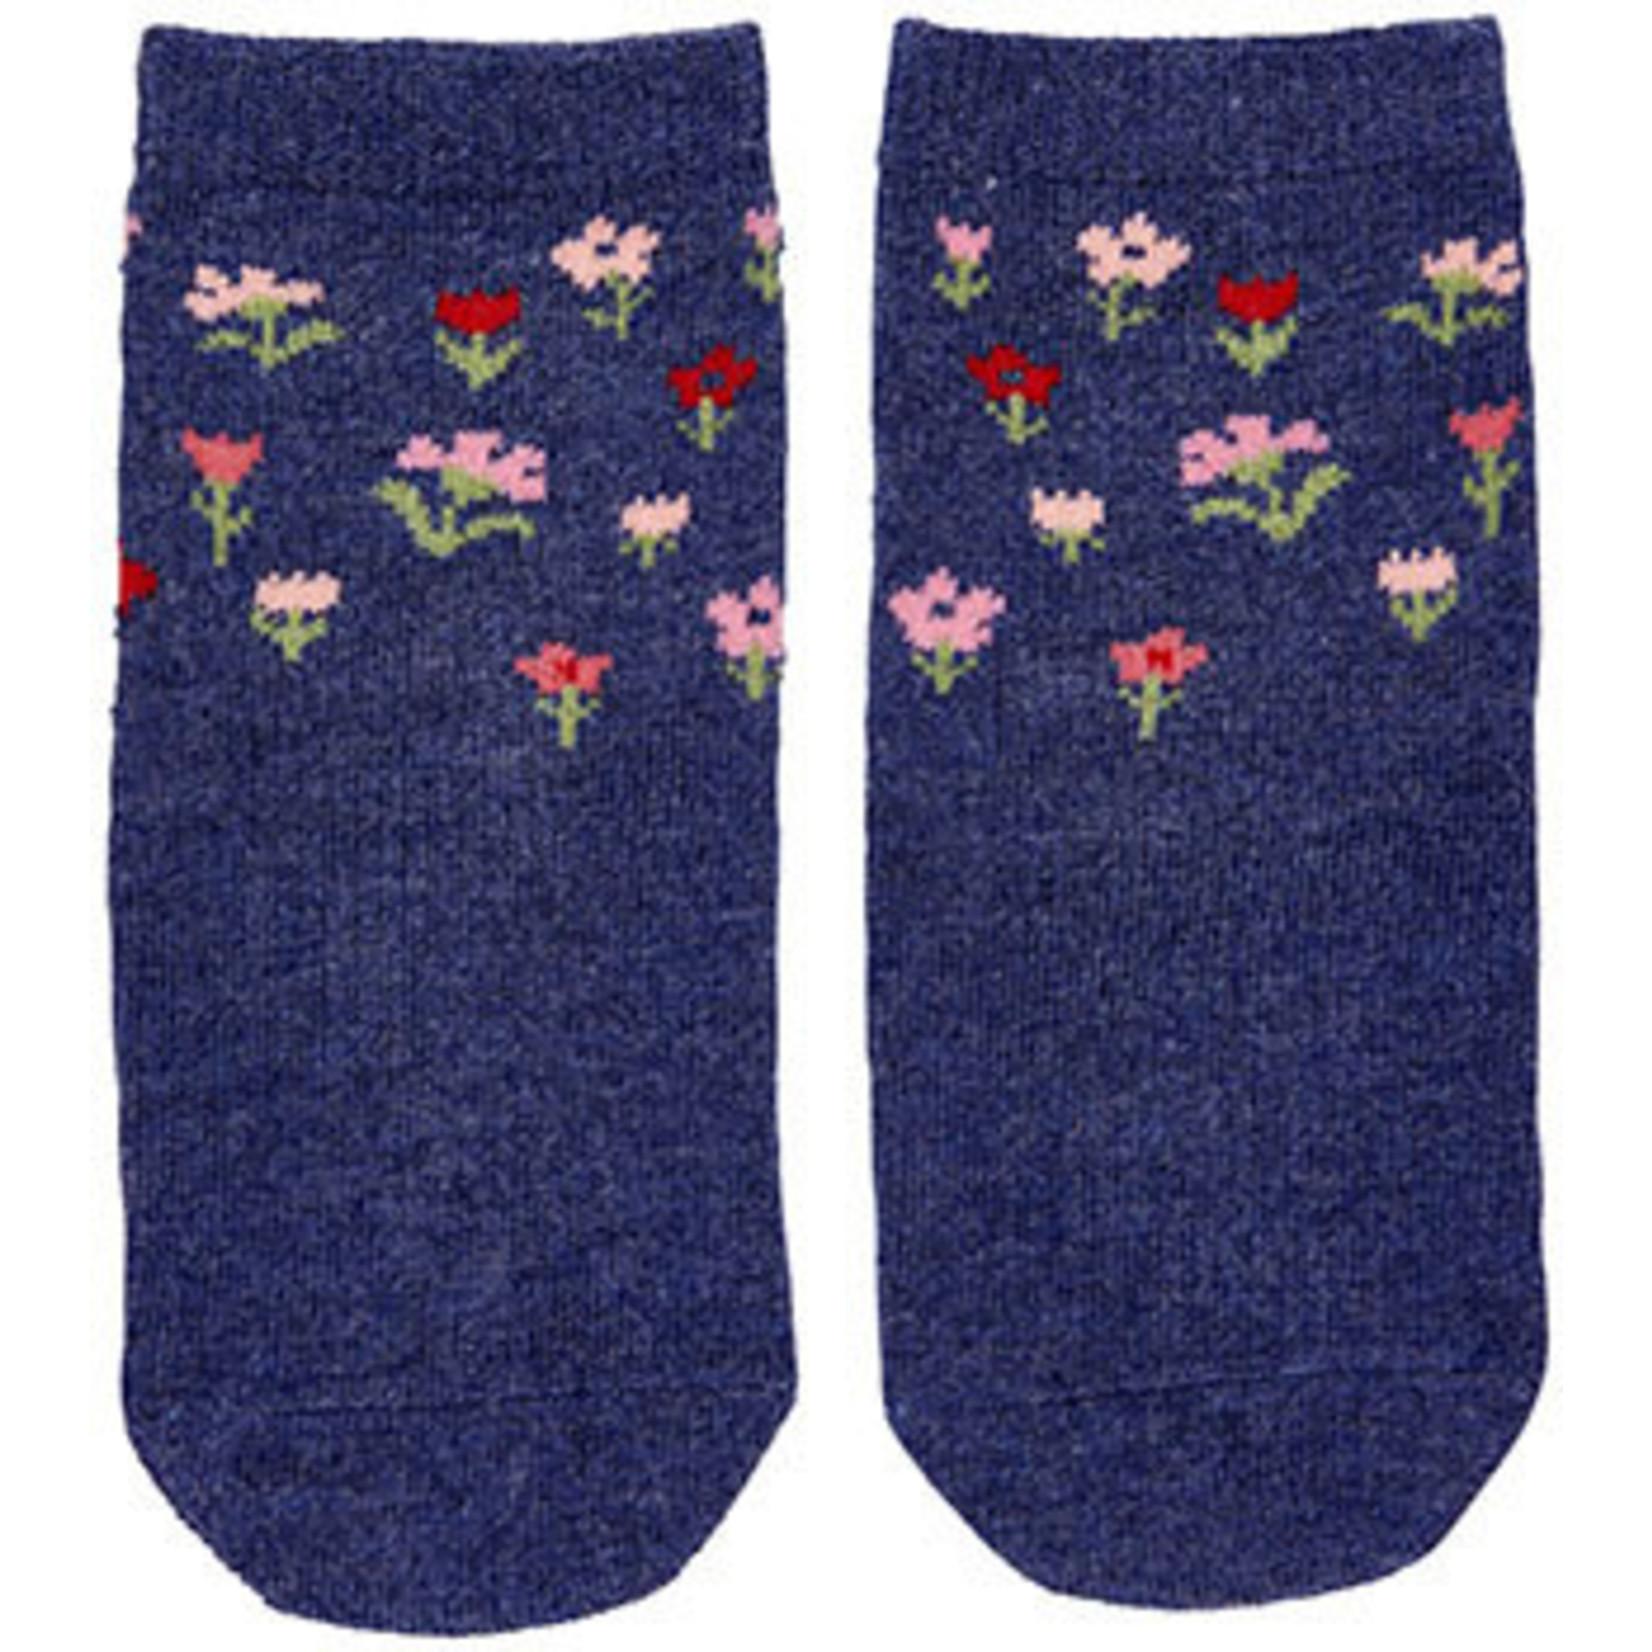 Toshi Toshi Organic Socks - Girls Periwinkle